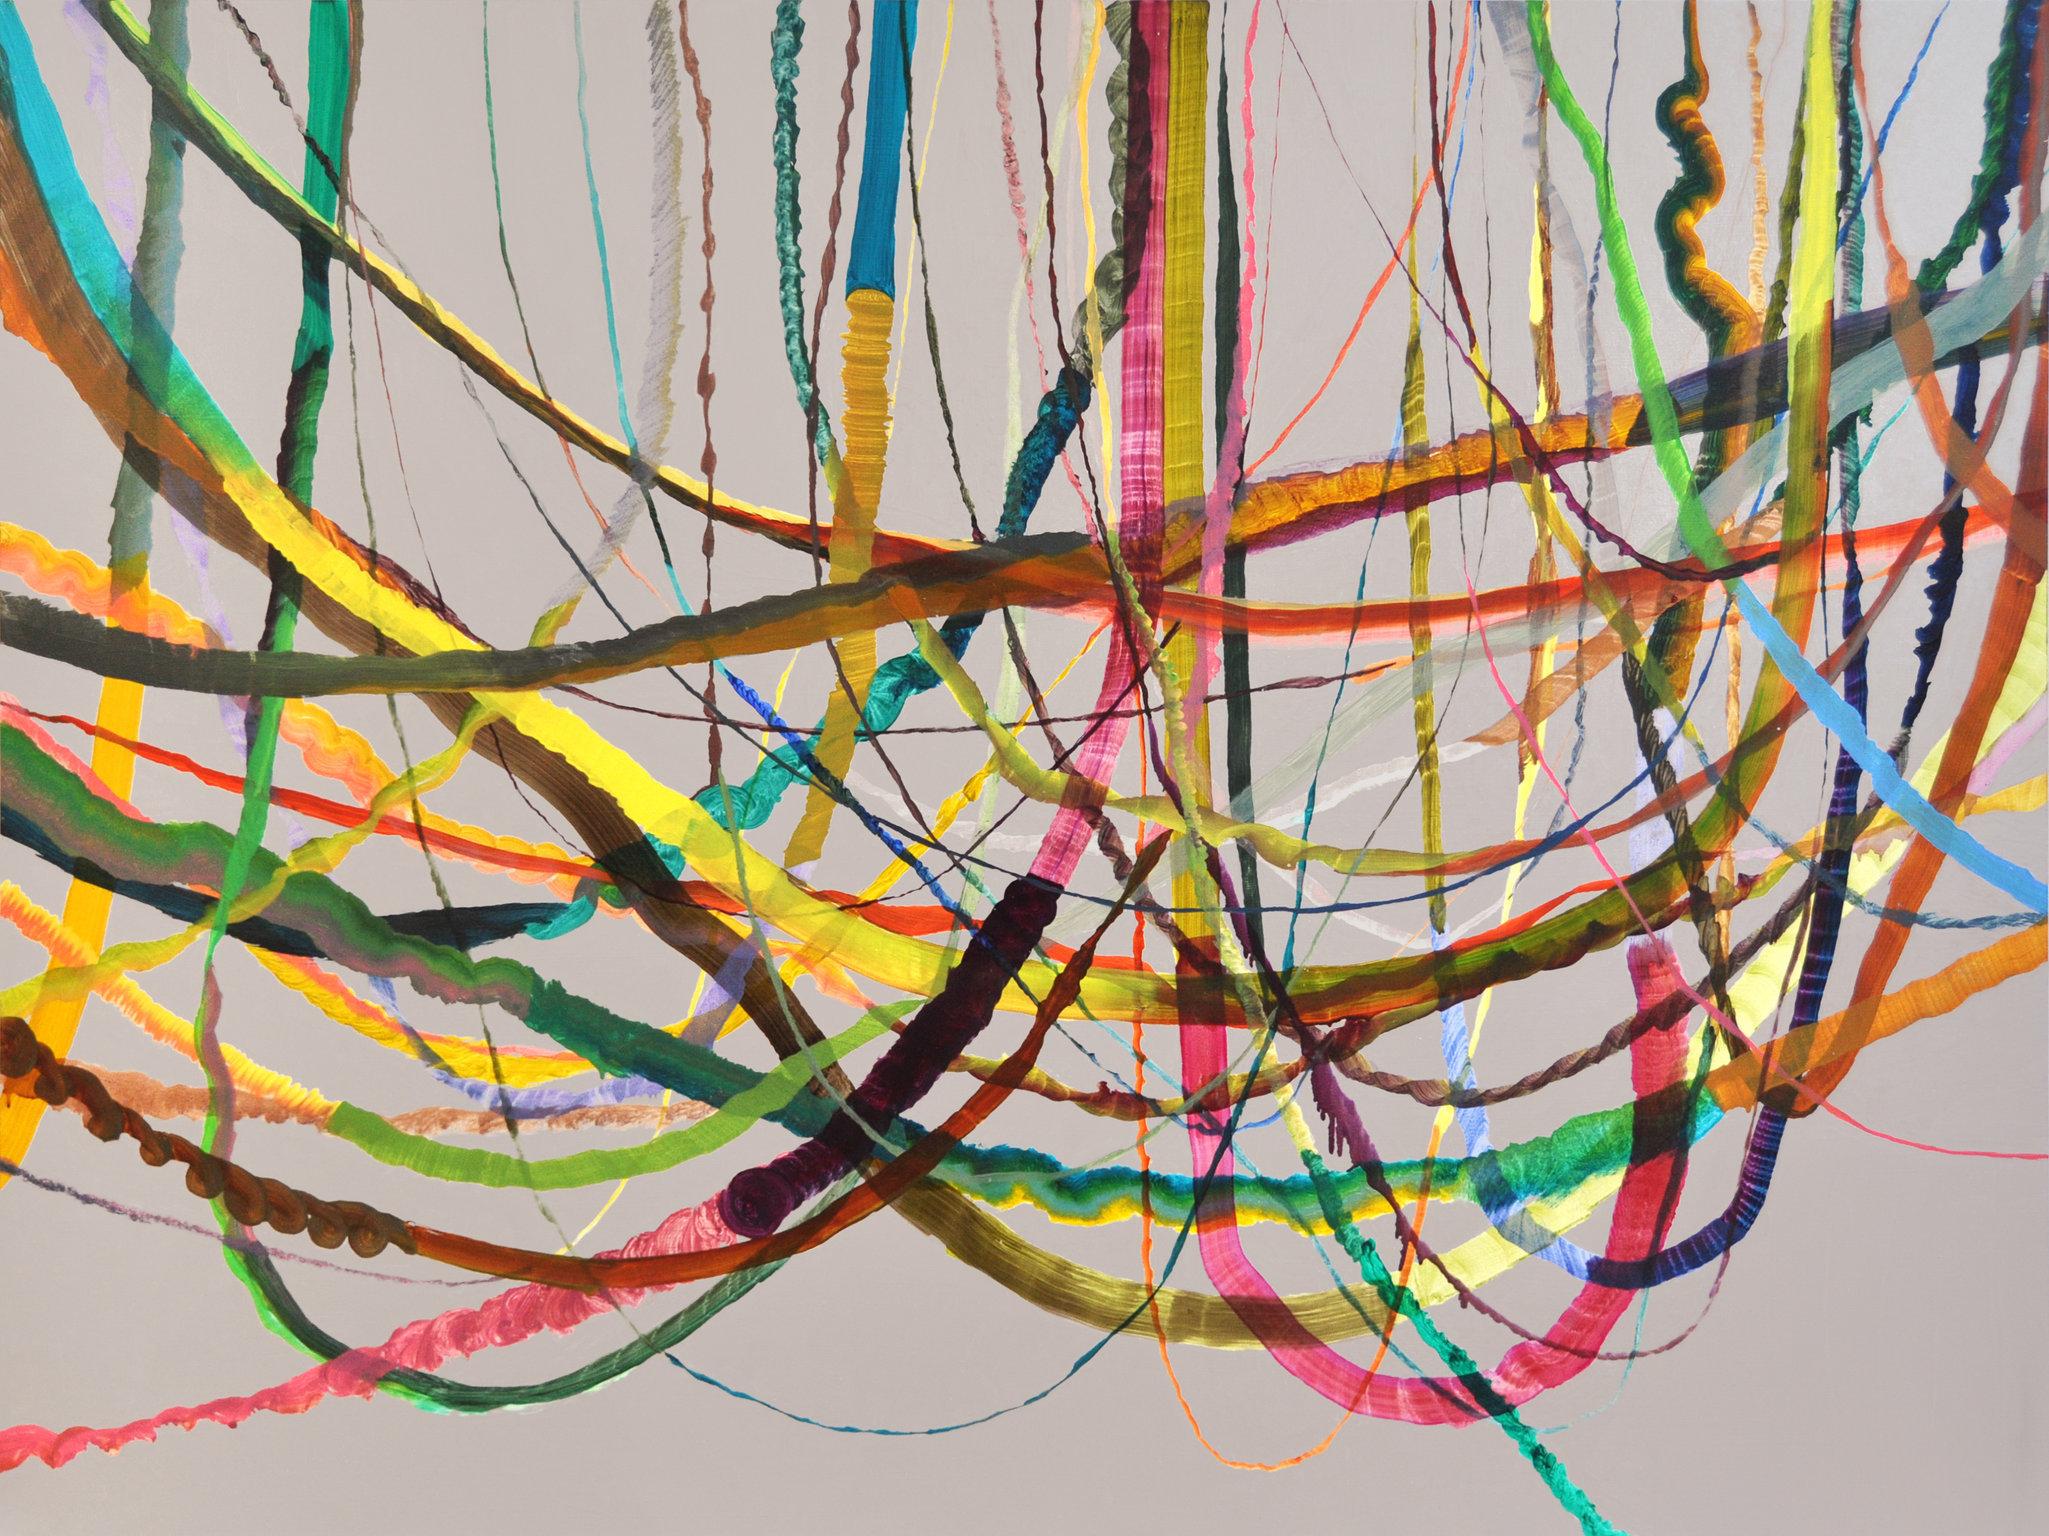 Dorrigo - Paddington Art Prize 2017 (Highly Commended)